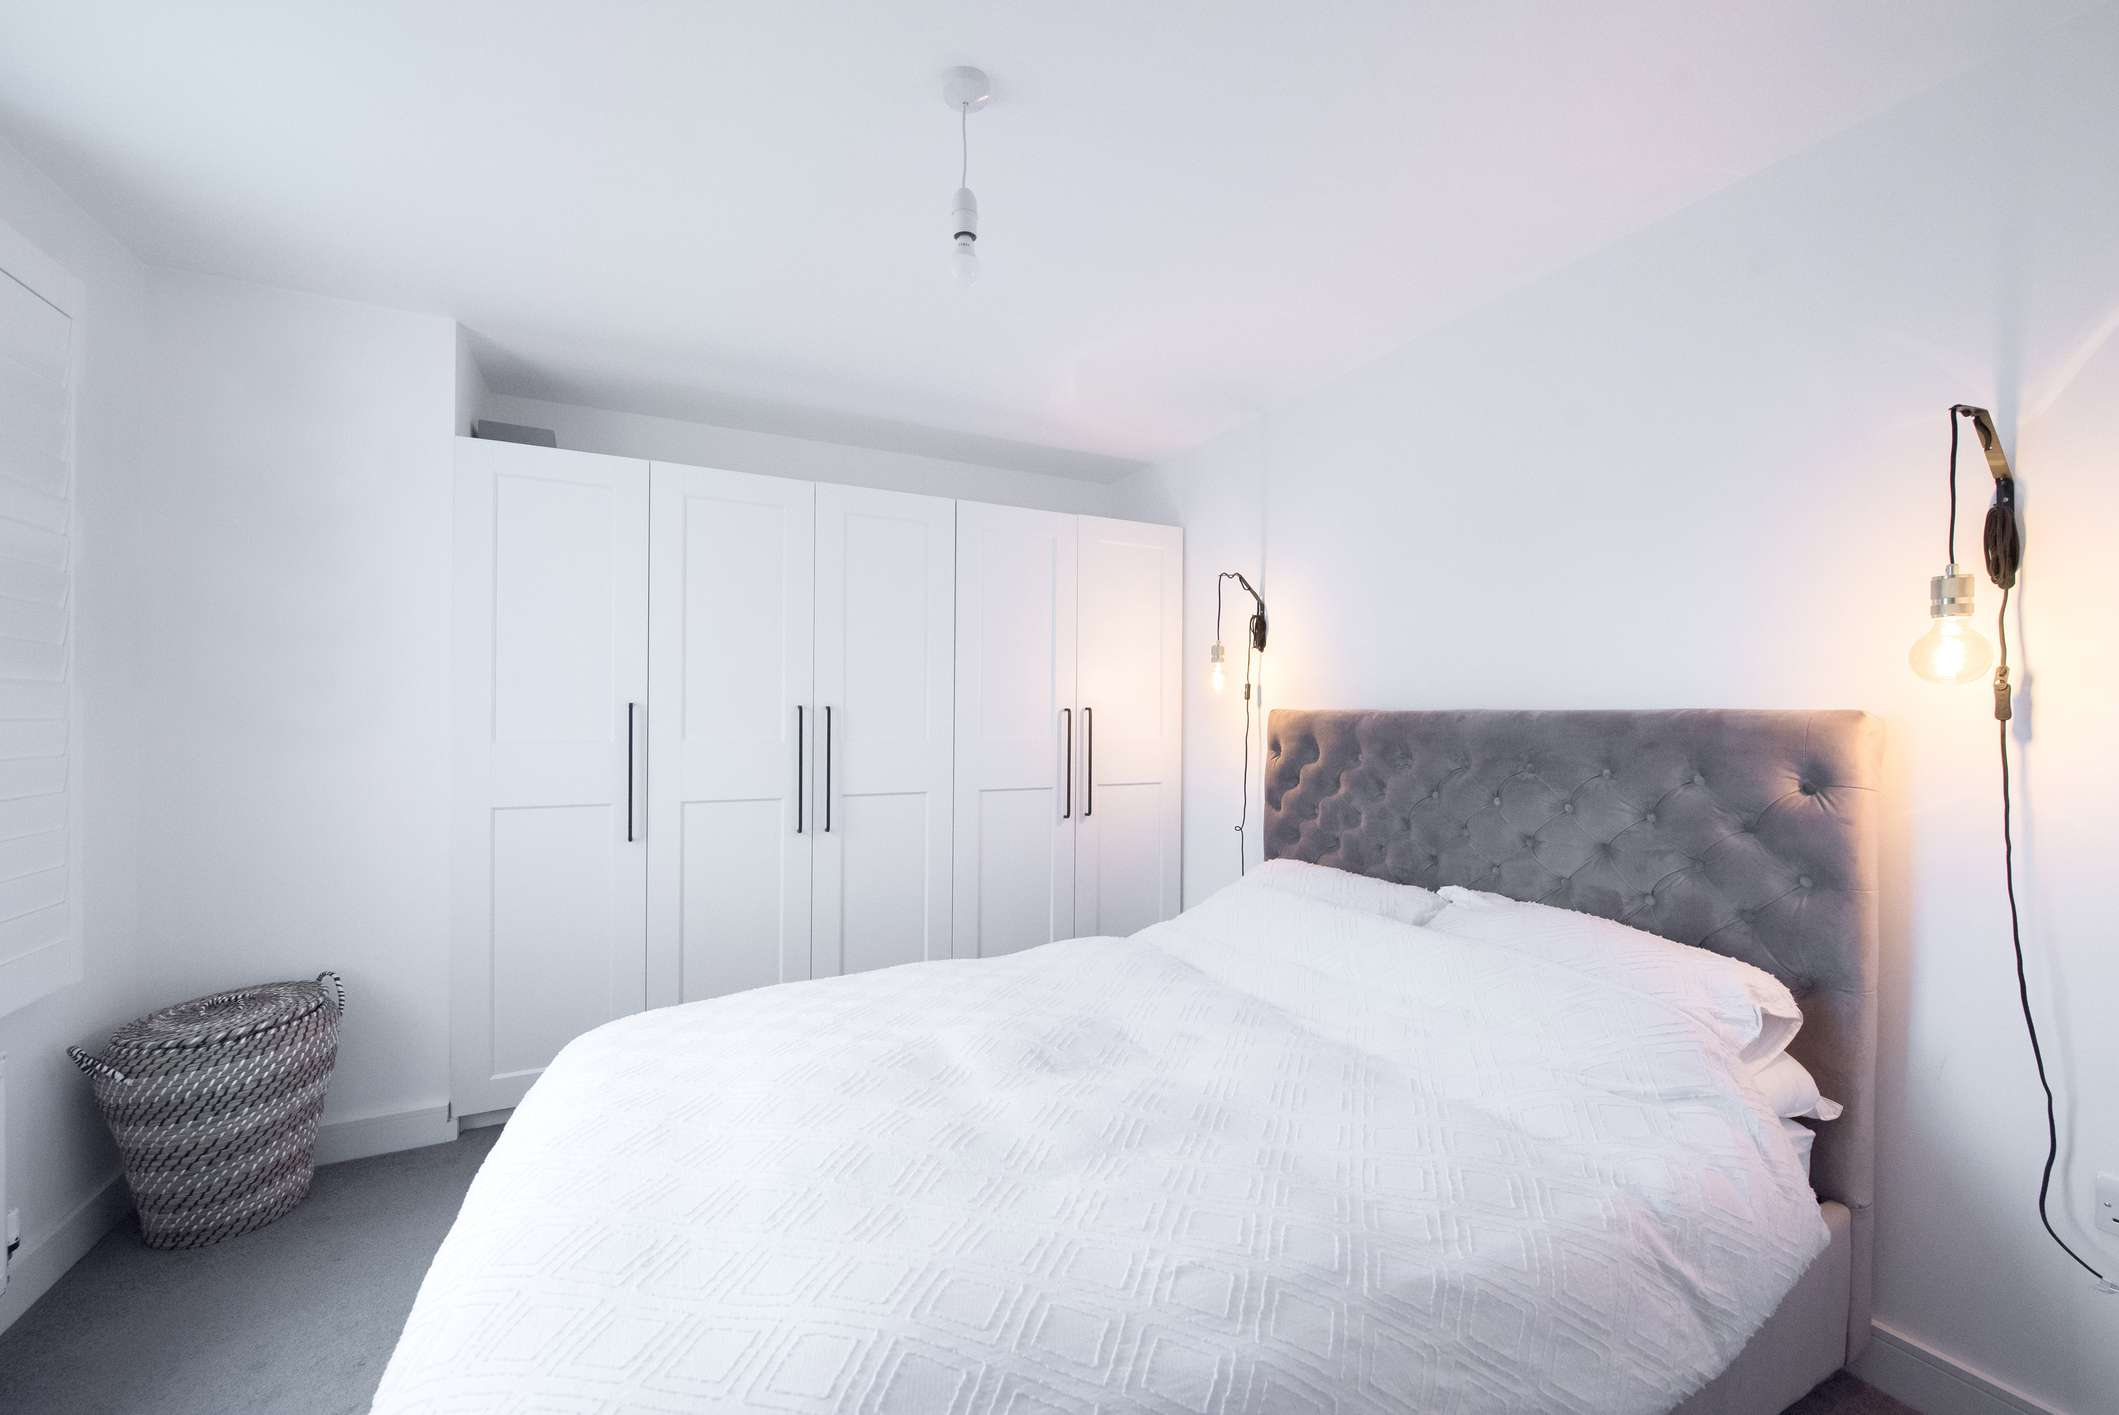 Luxury Flat Interiors